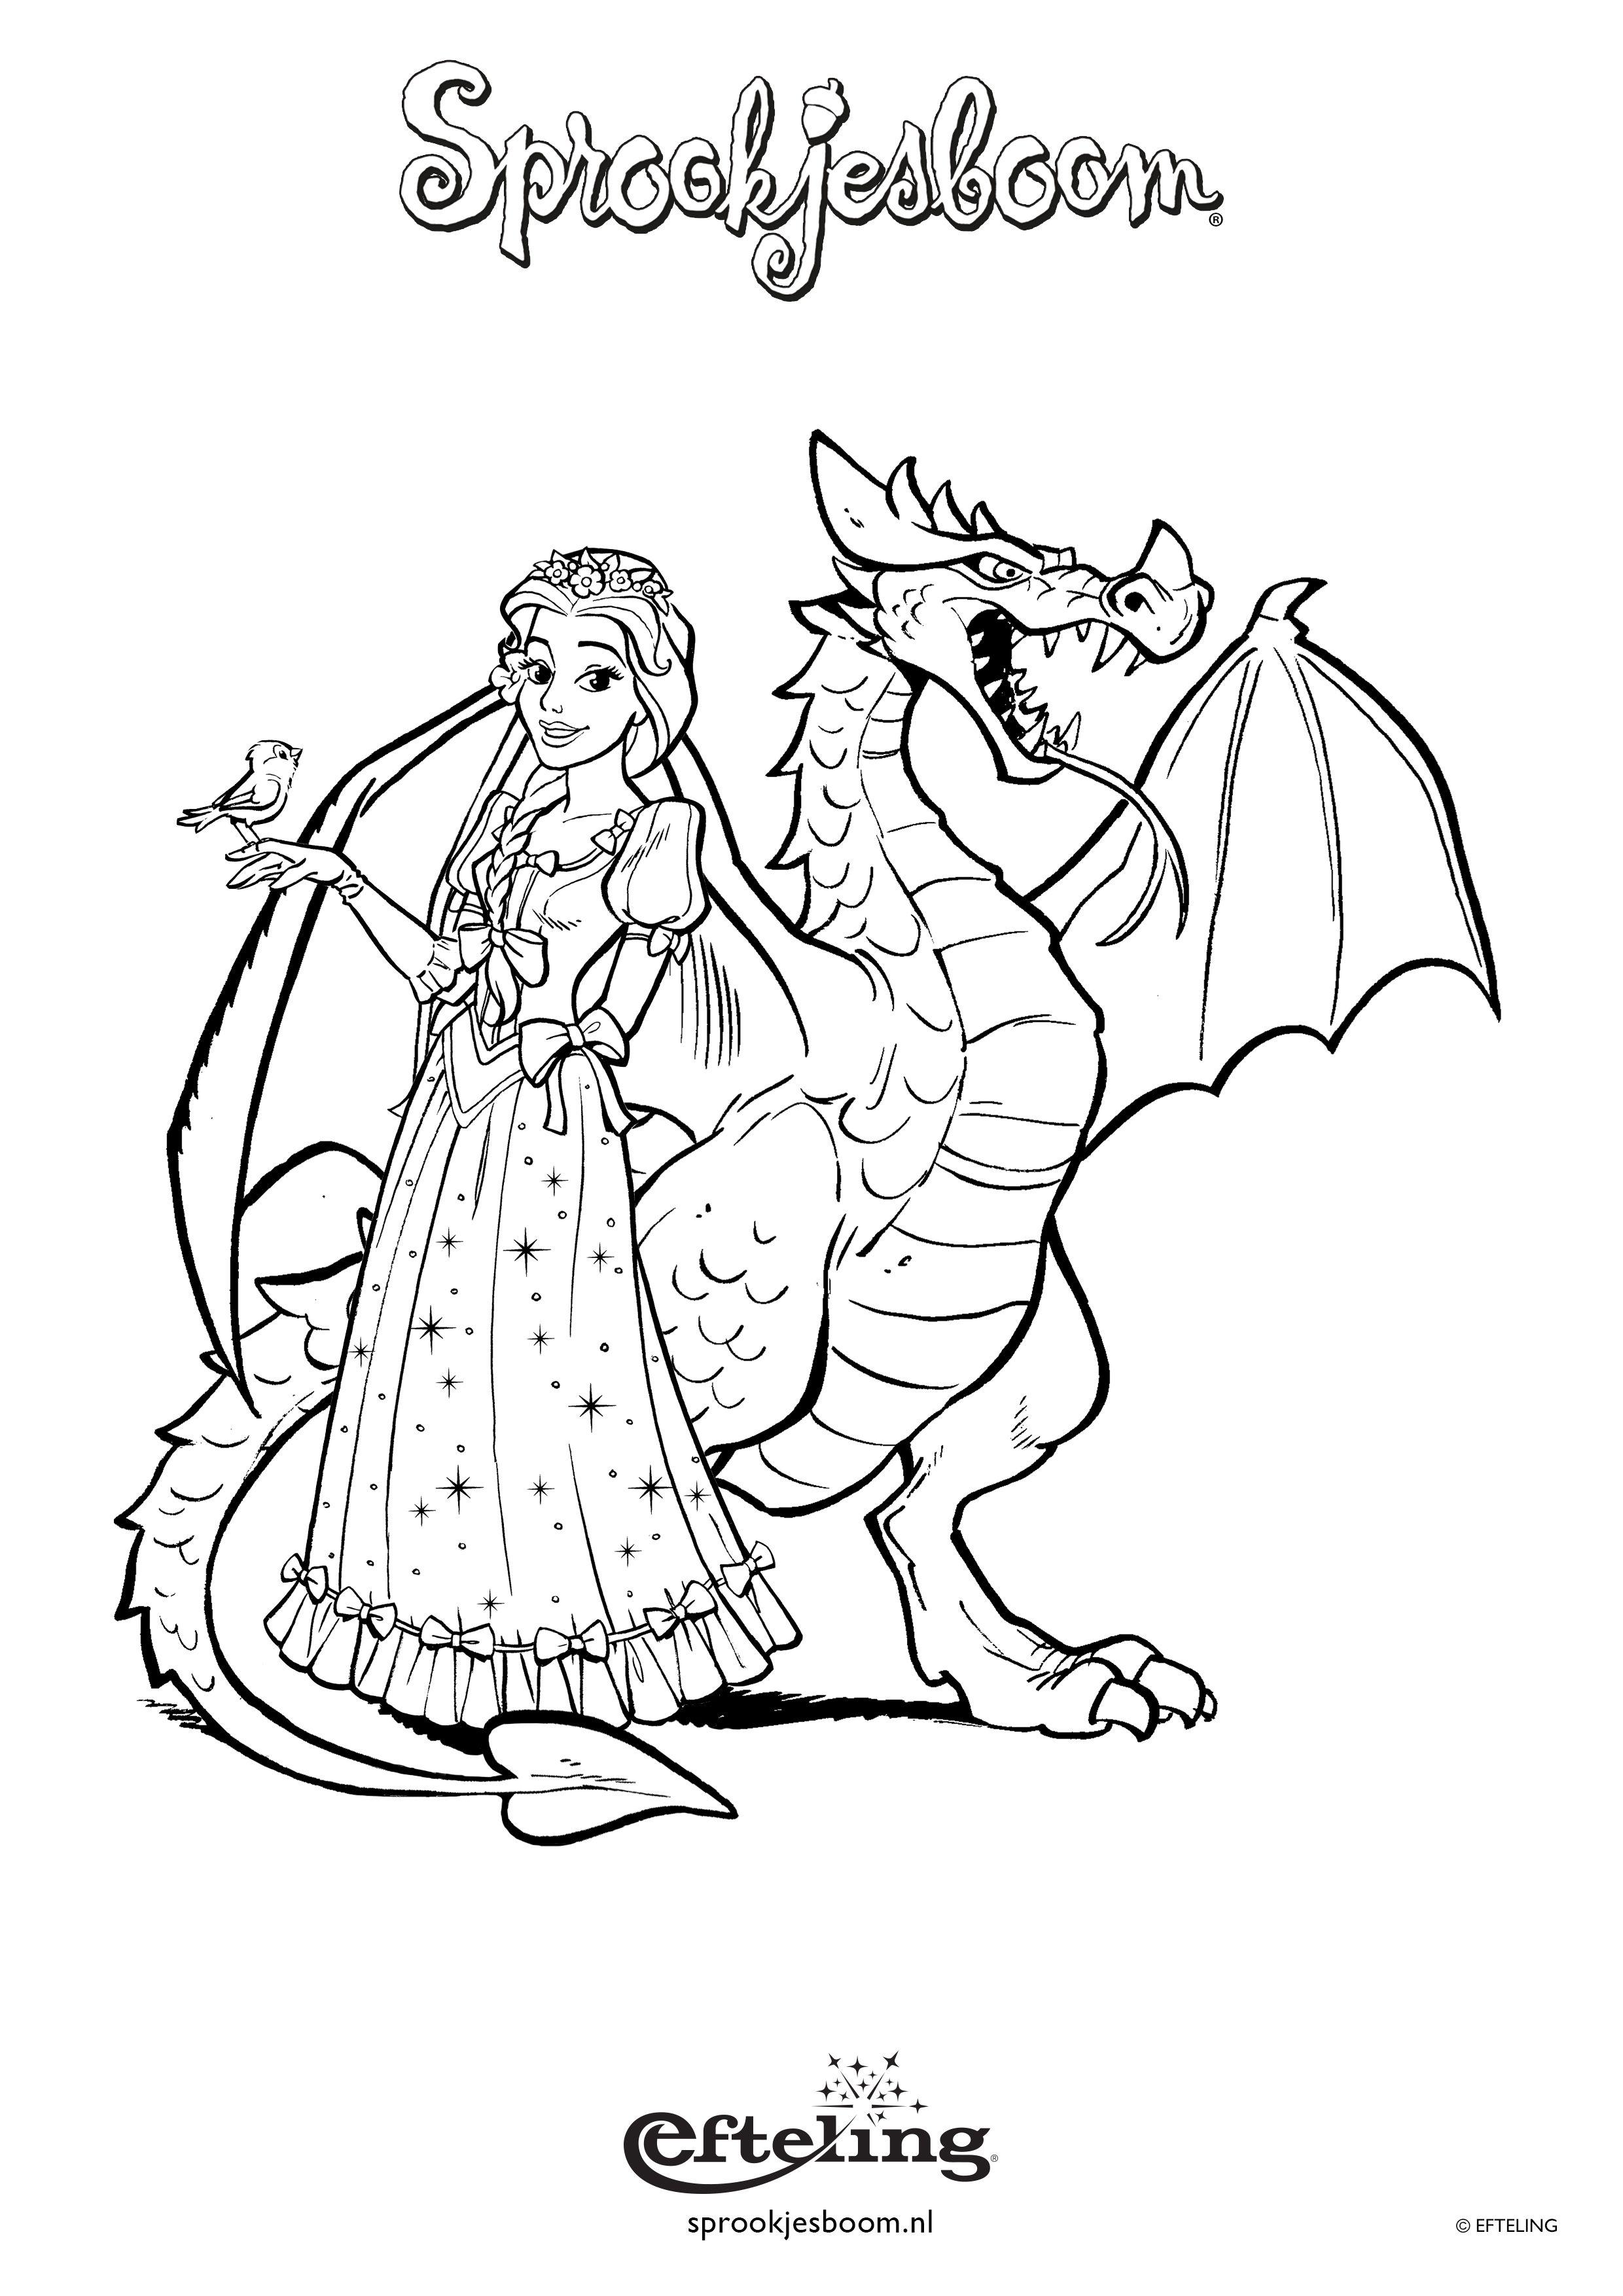 Sprookjesboom Kleurplaat Met Assepoester En Draak Verjaardagsfeest